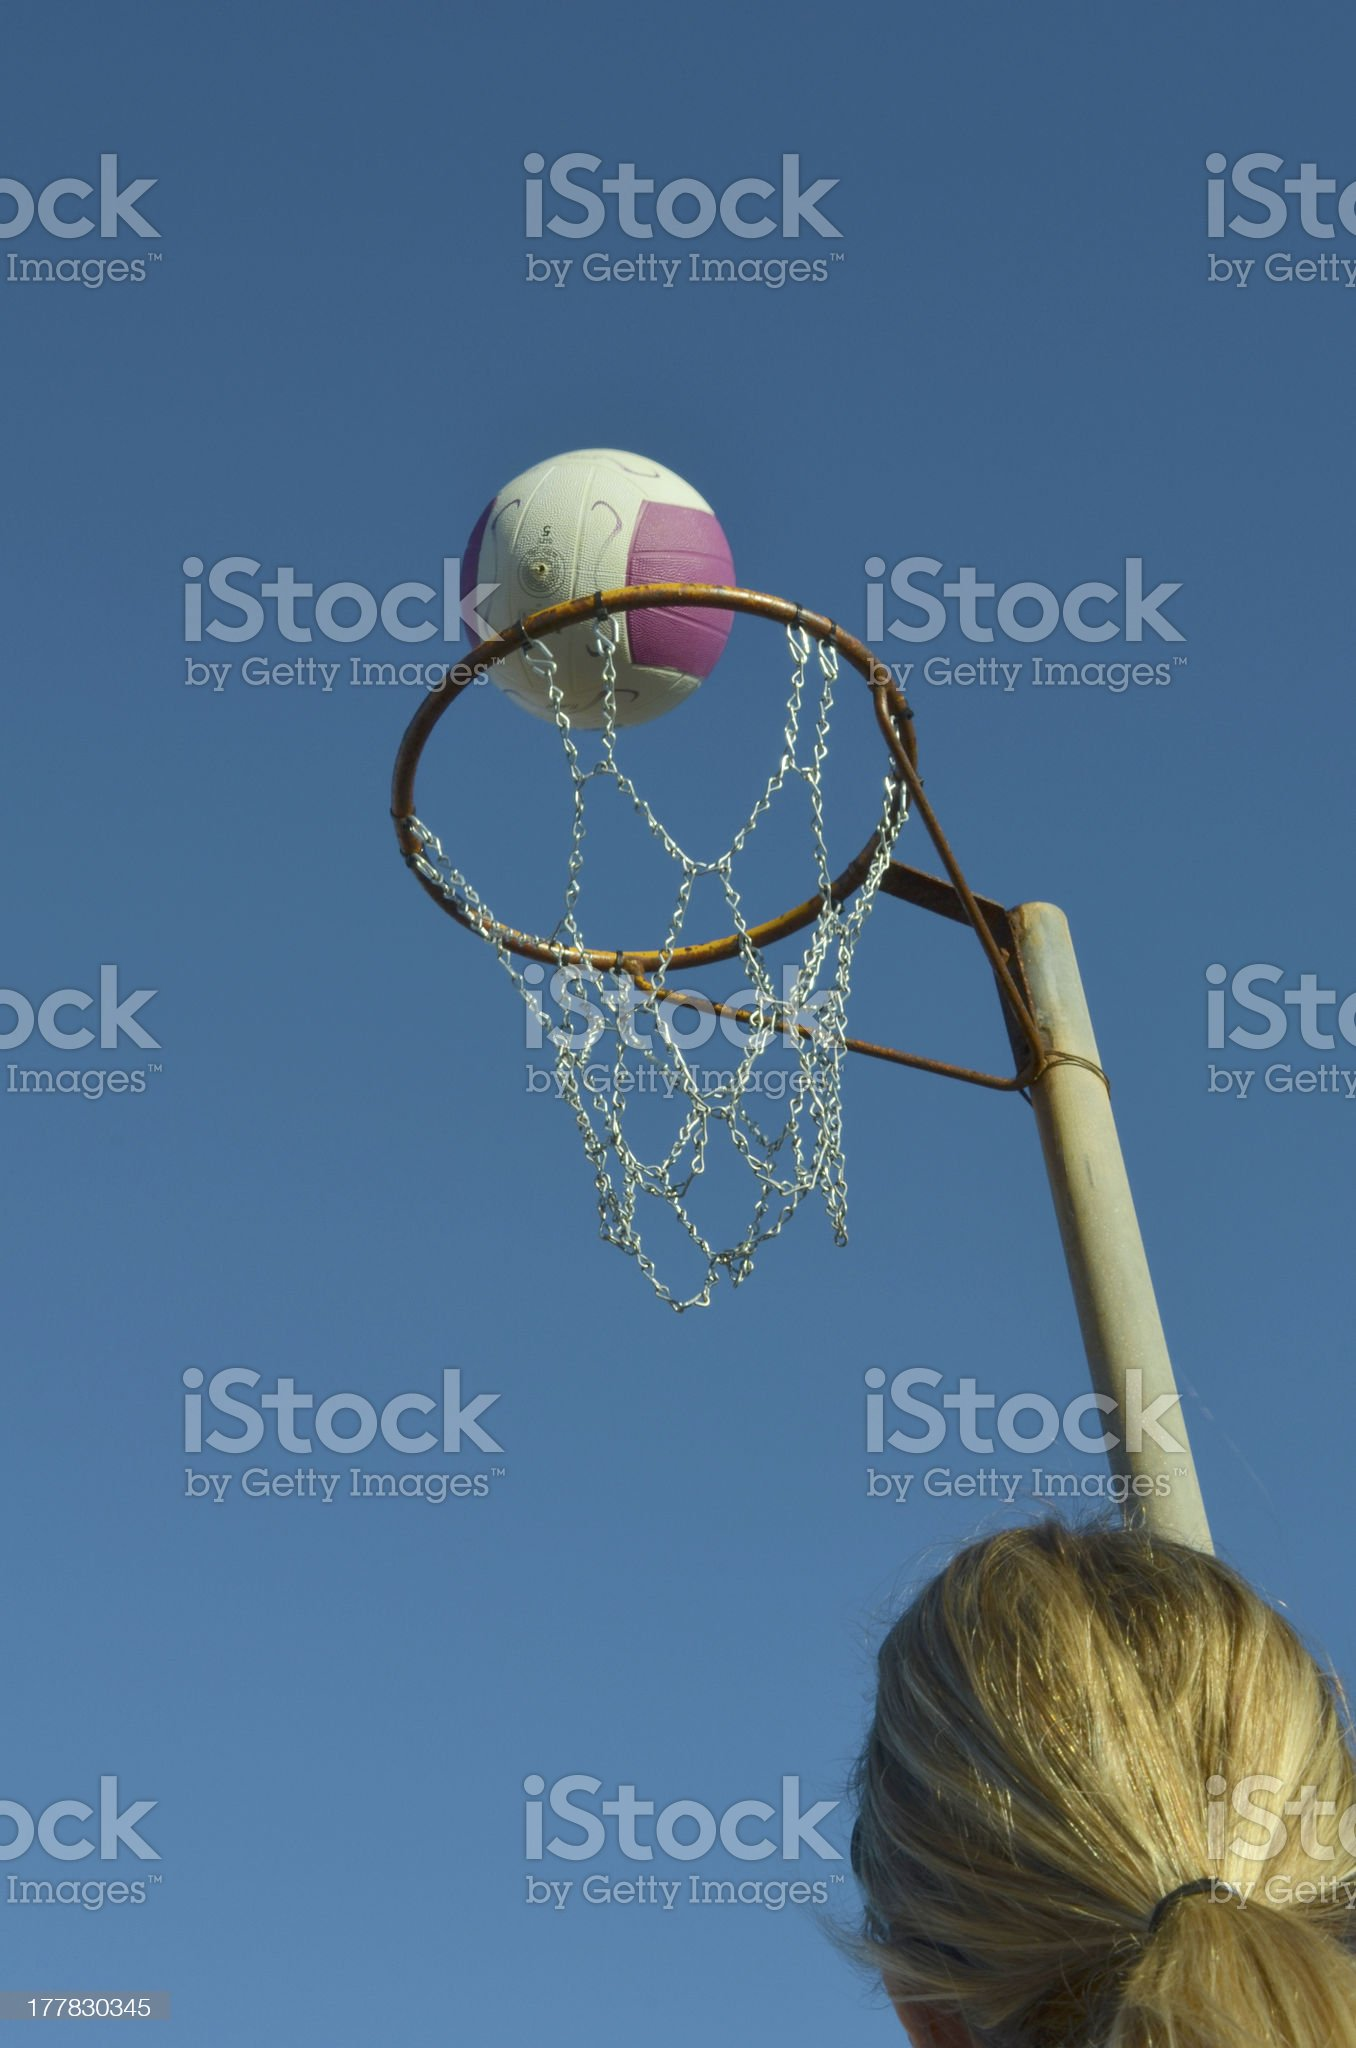 Shooting a Netball Goal royalty-free stock photo